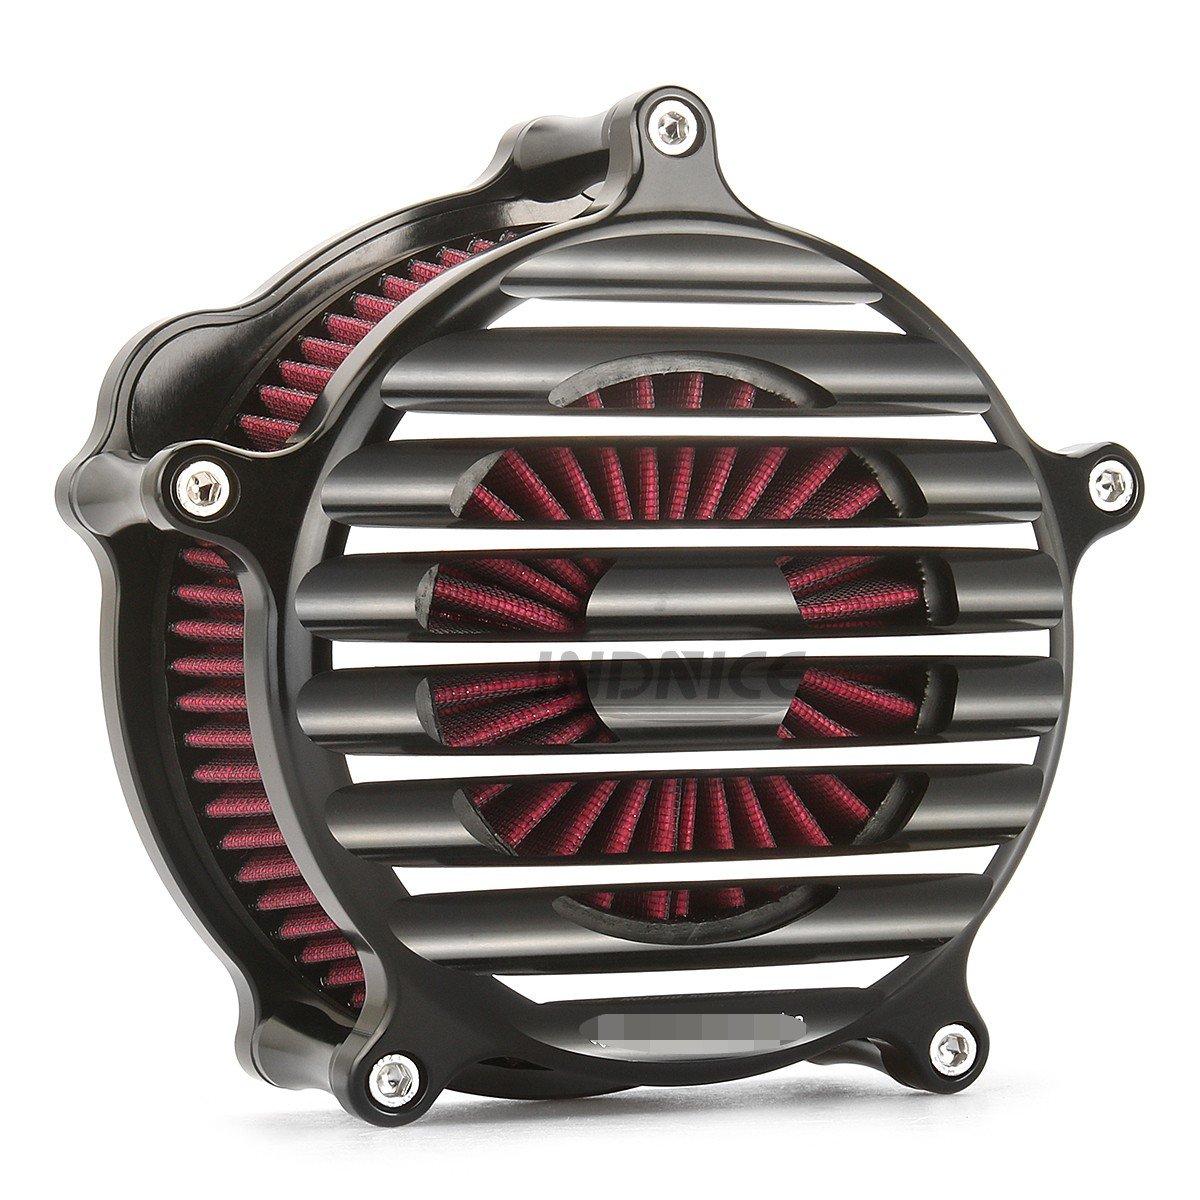 CNC edge cut RSD Nostalgia Venturi Air intake system for harley sportster xl883 1200 air filters sportster 883 1991-2018   B07DD8ZKJC